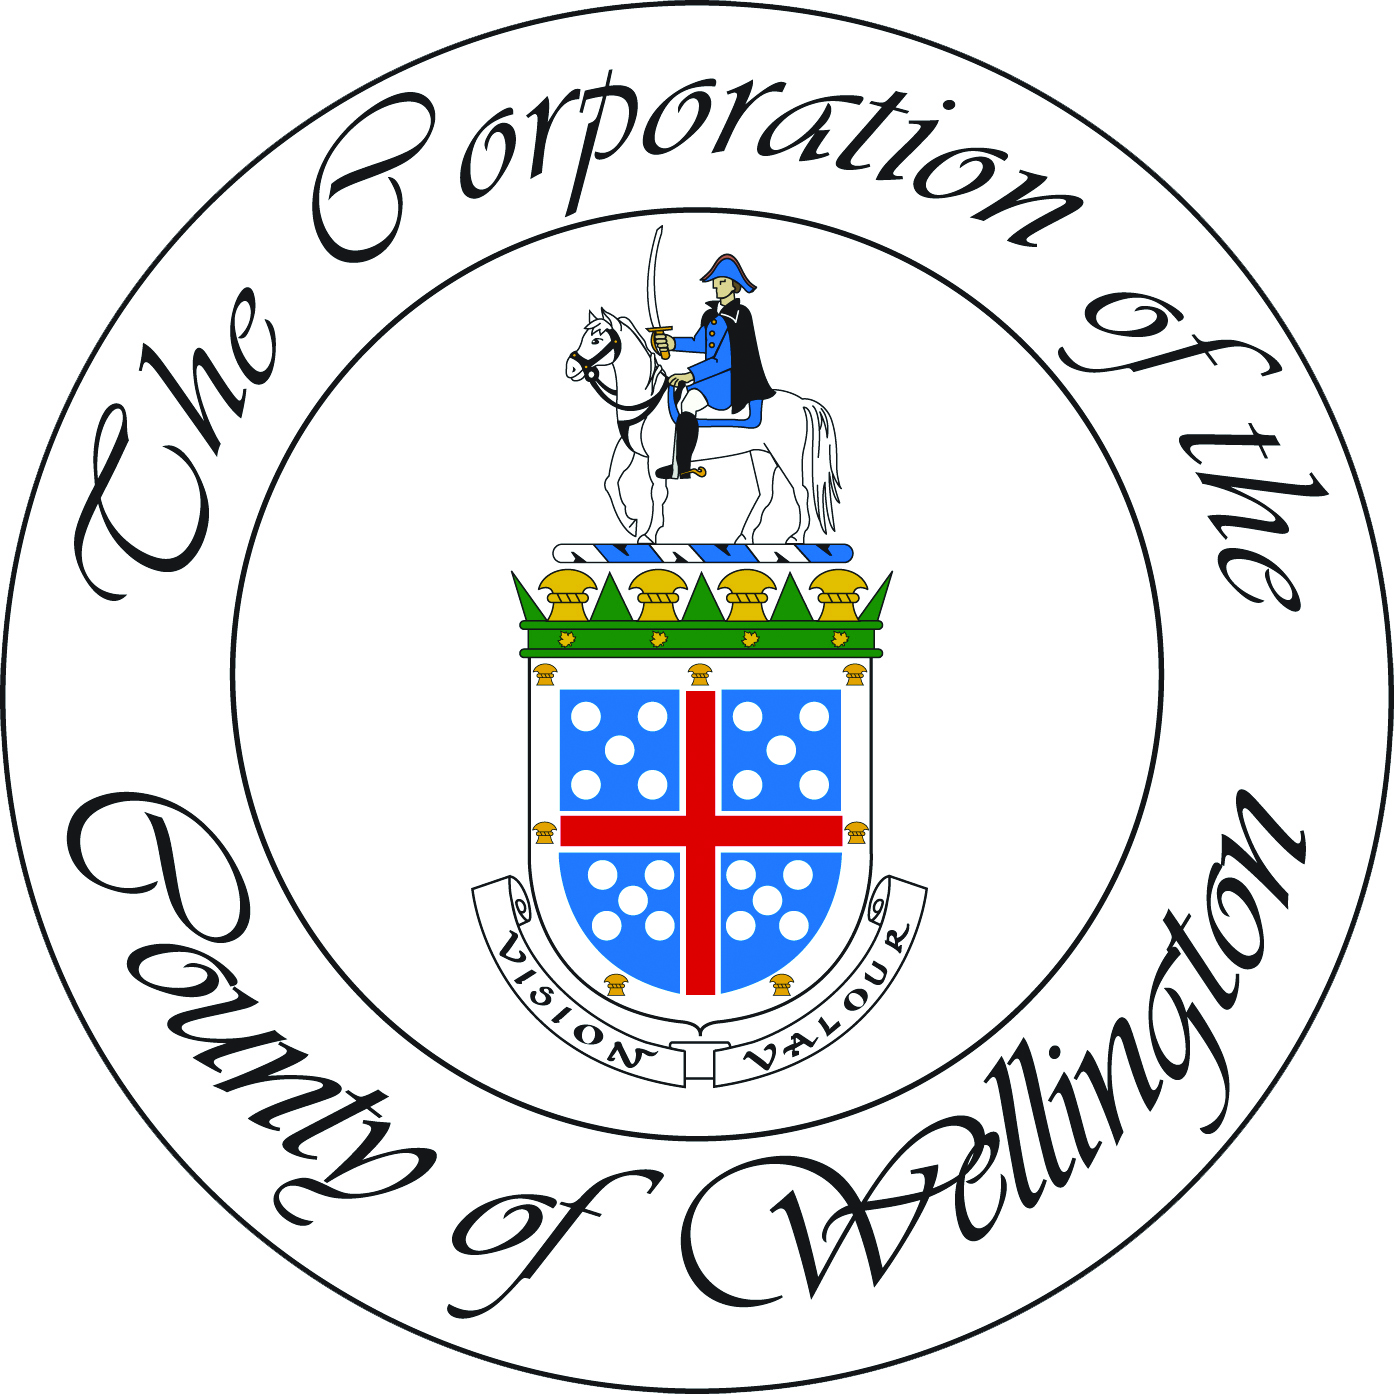 Wellington County Website image